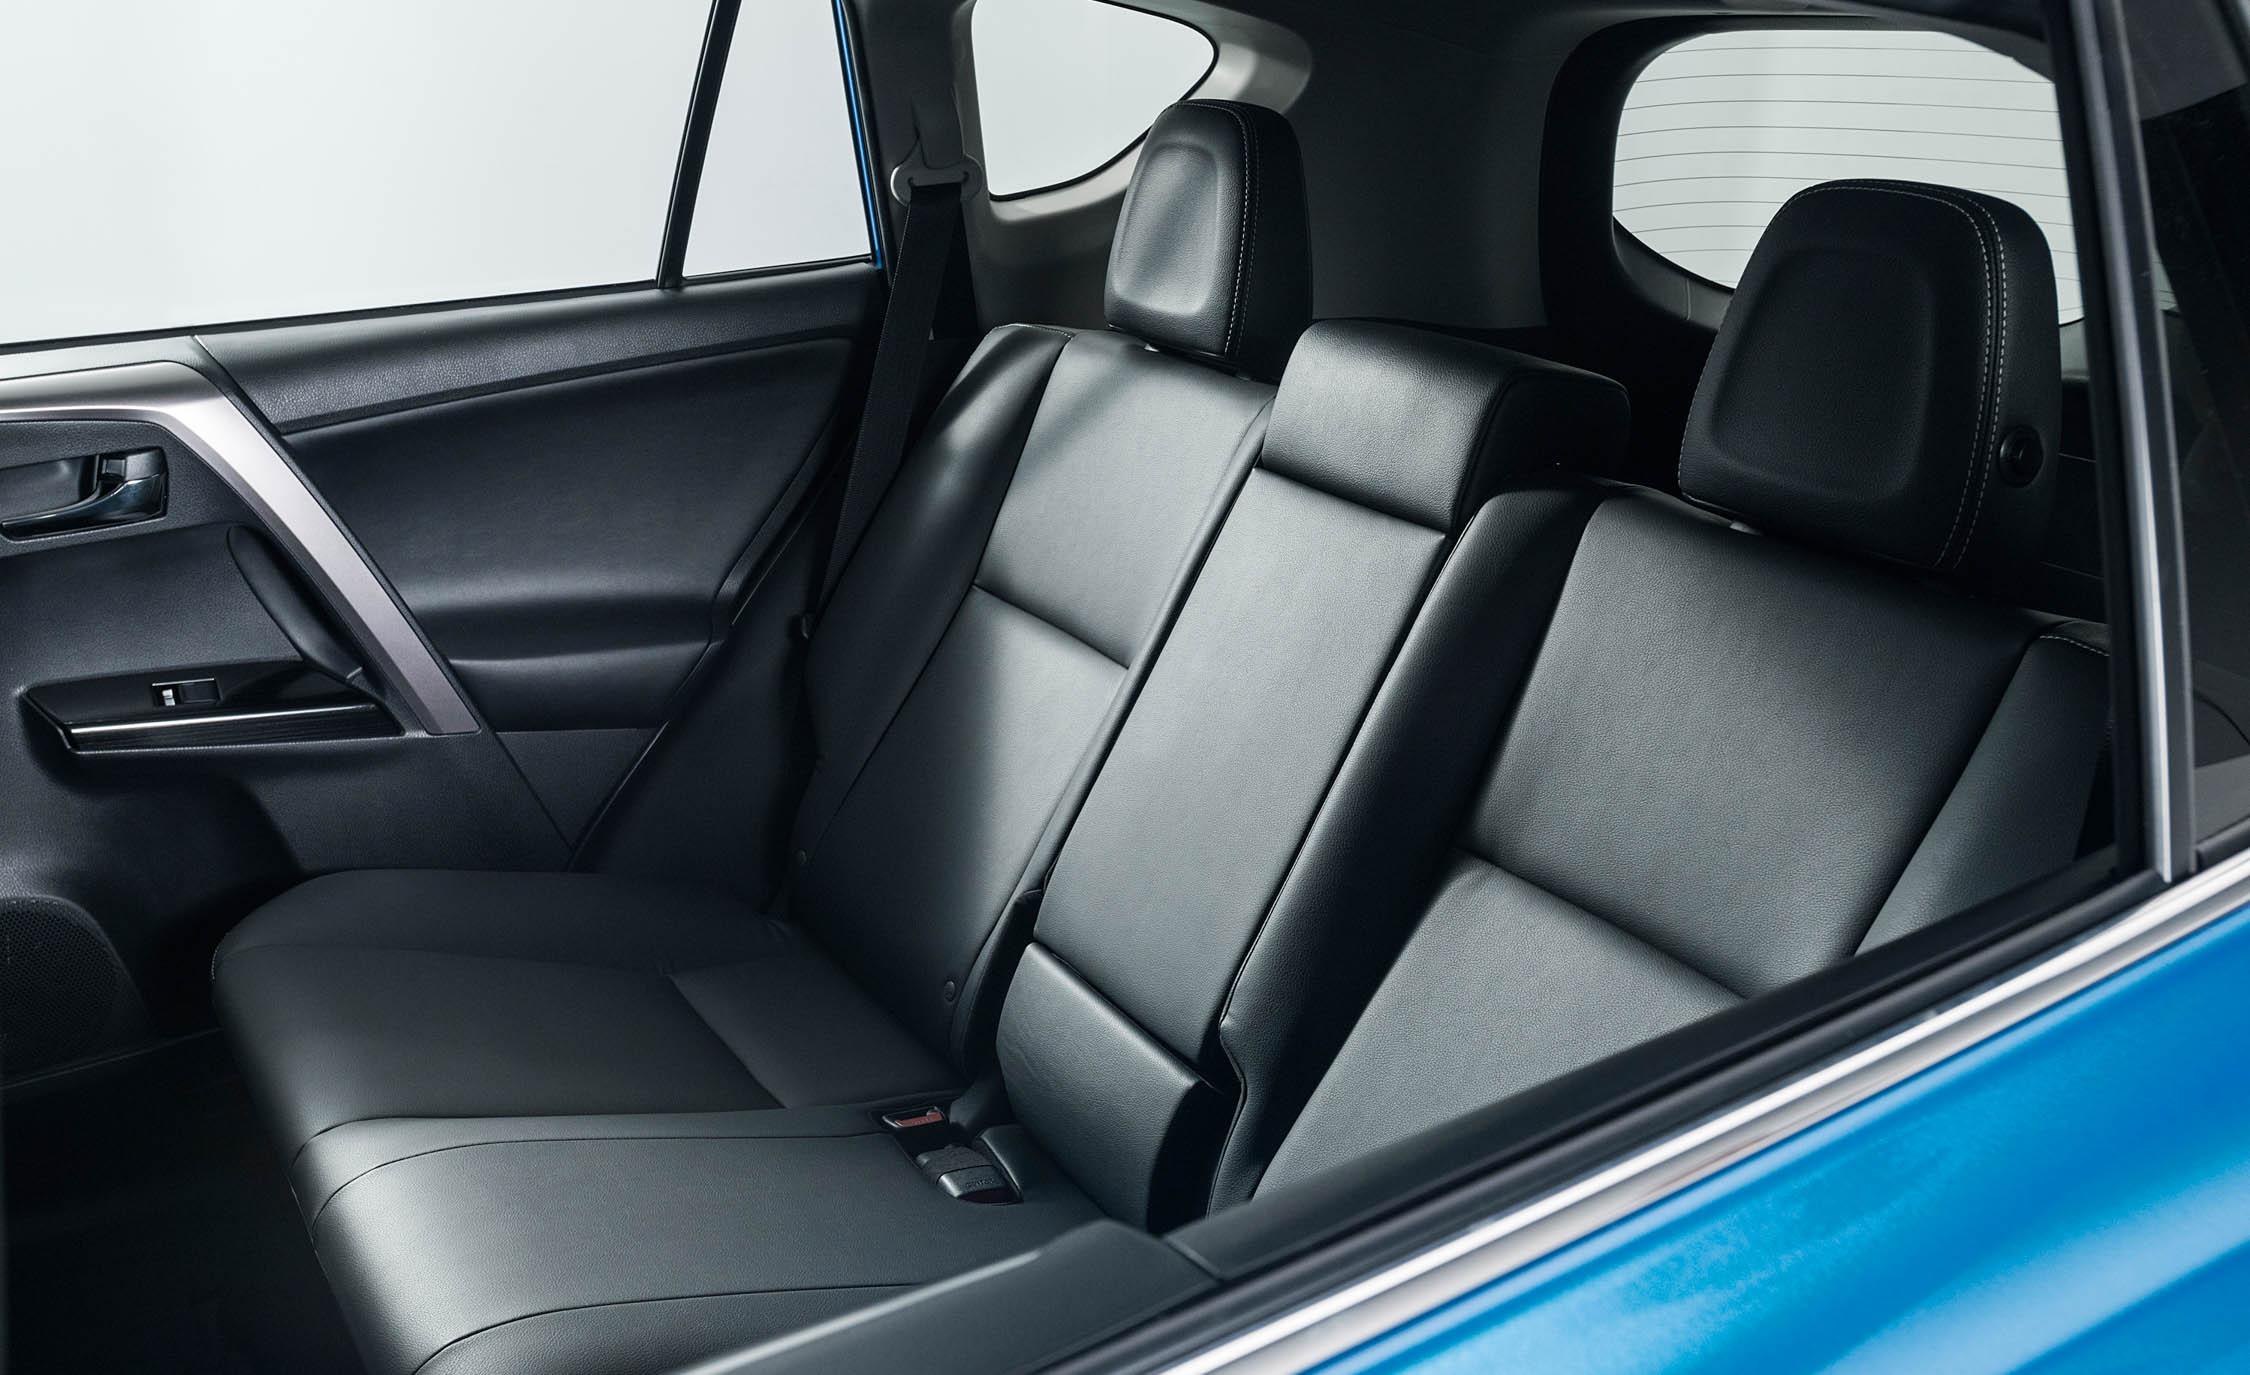 2016 Toyota RAV4 Hybrid Interior Rear Passenger Seats